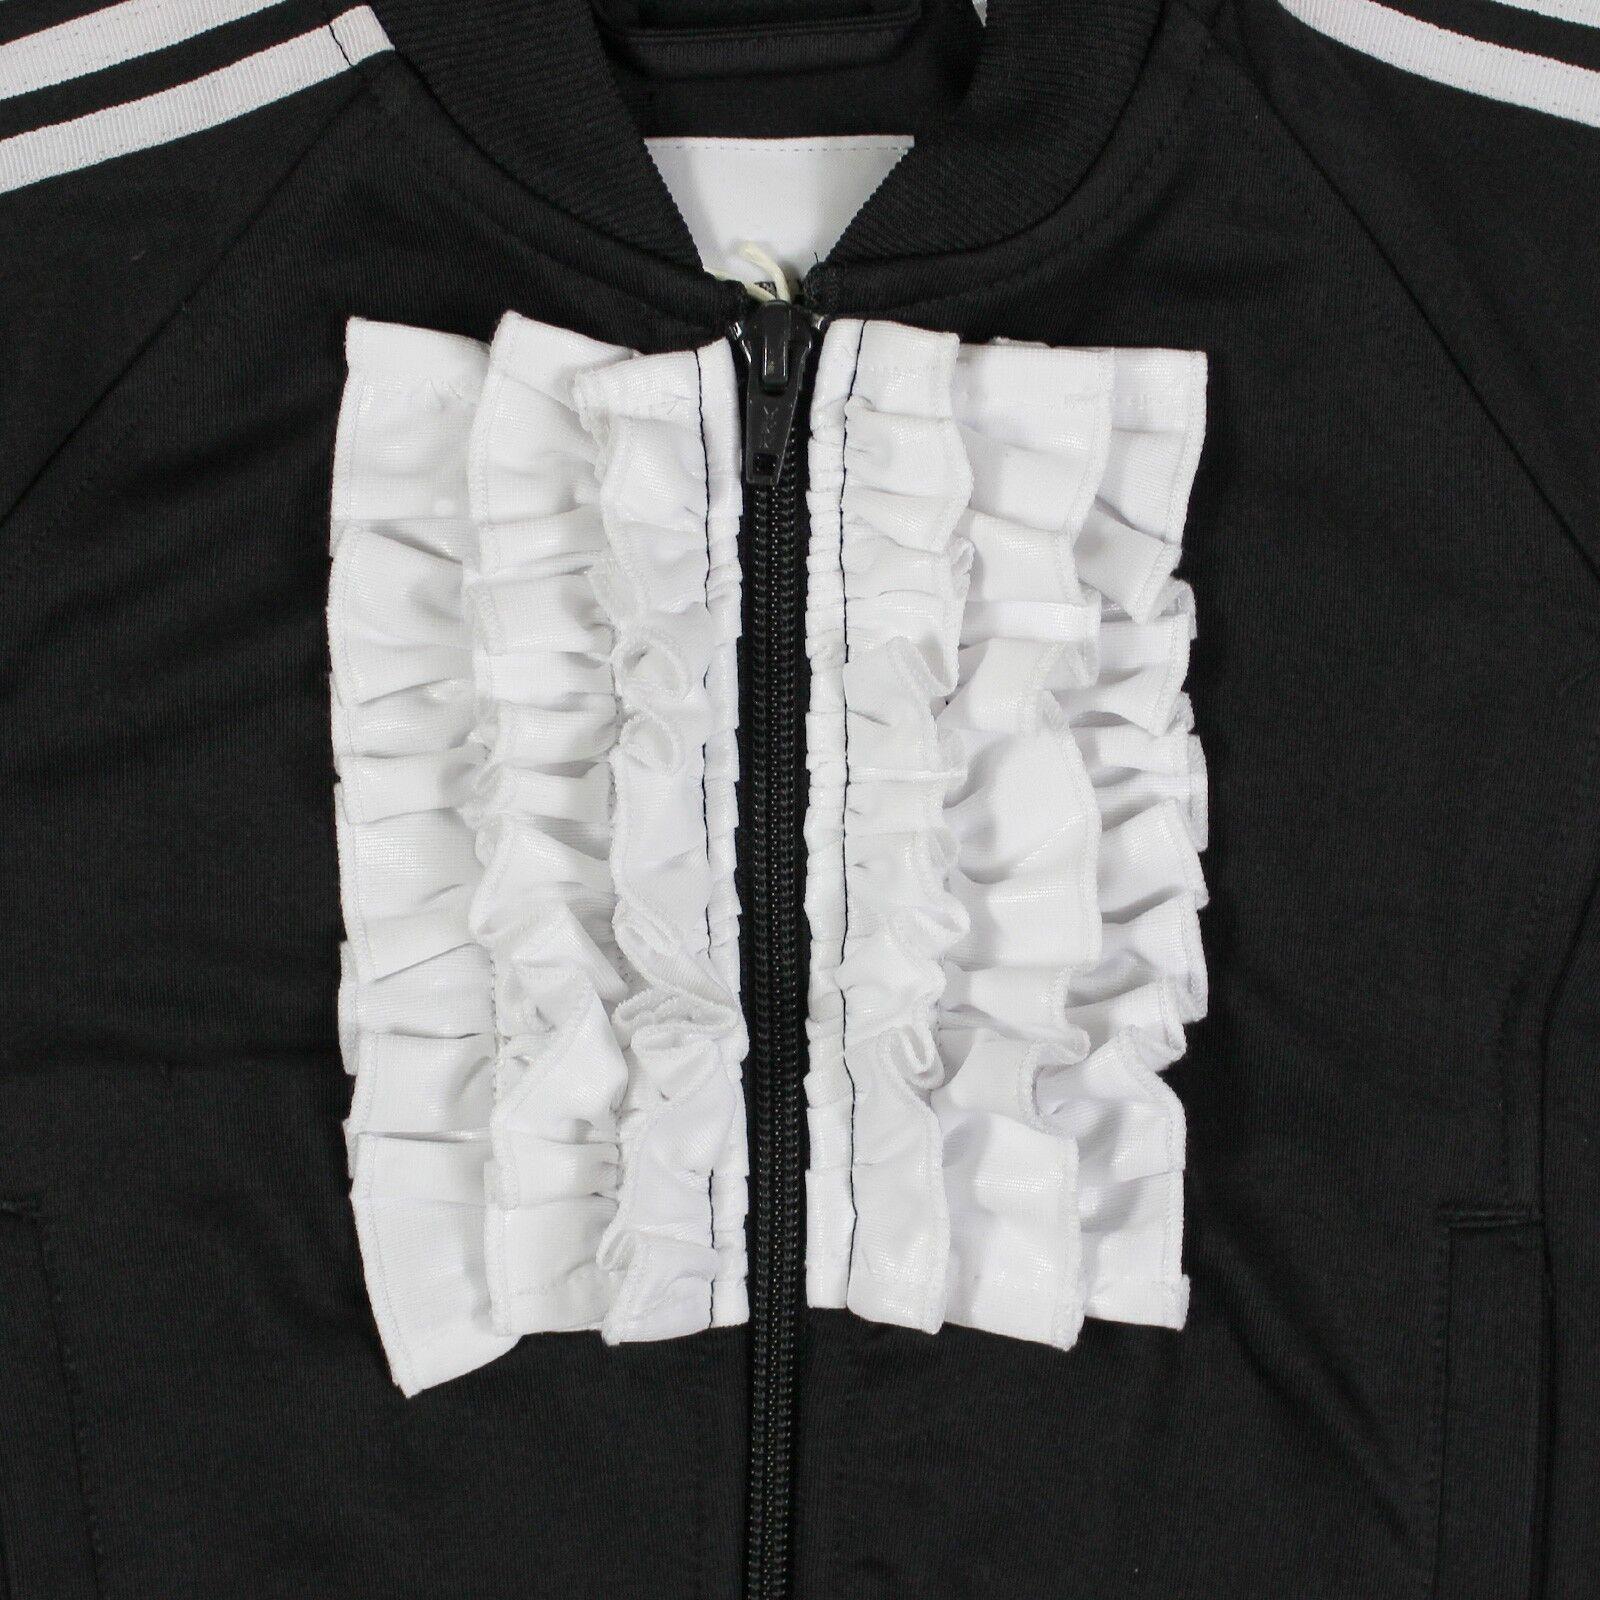 edb5d8ee adidas Originals Children Tuxedo Jogger Jeremy Scott Tracksuit Suit Baby 62